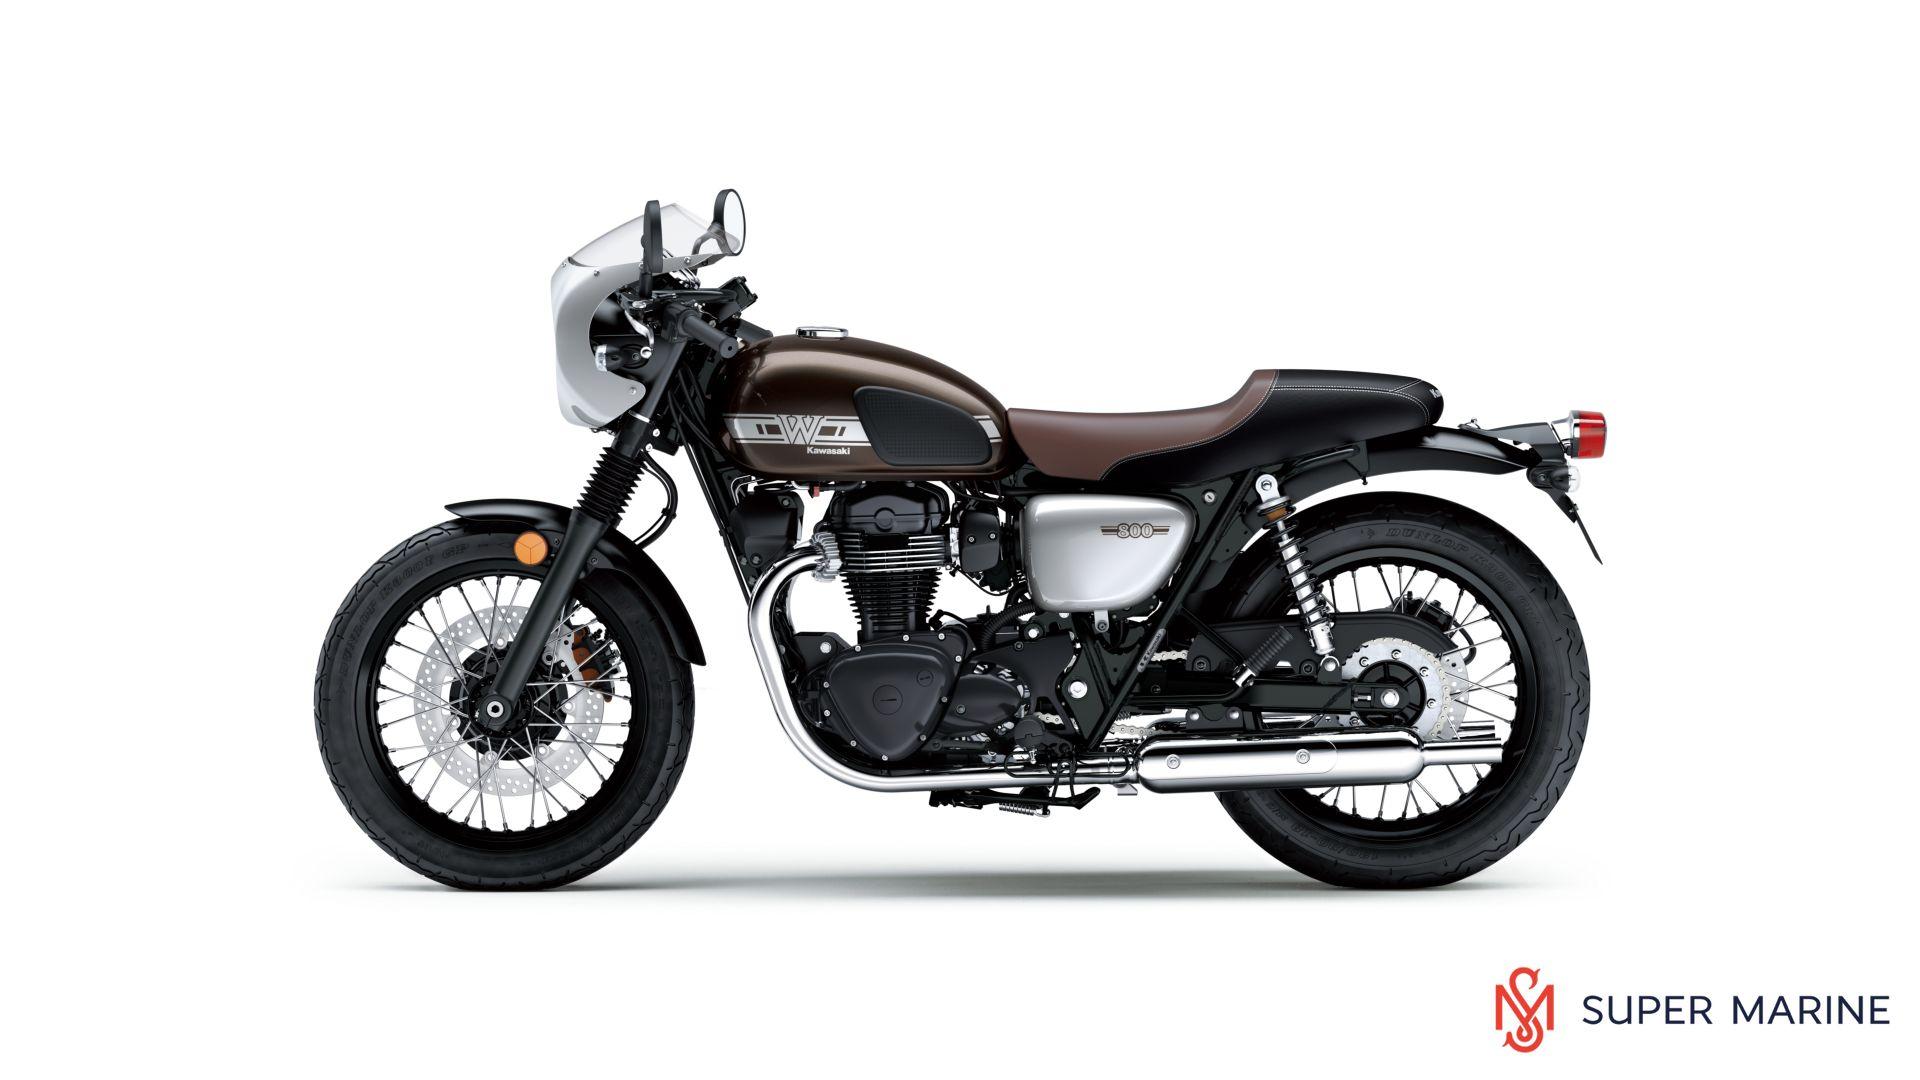 мотоцикл Kawasaki W800 Cafe серый 2019 супер марин мотосалоны и